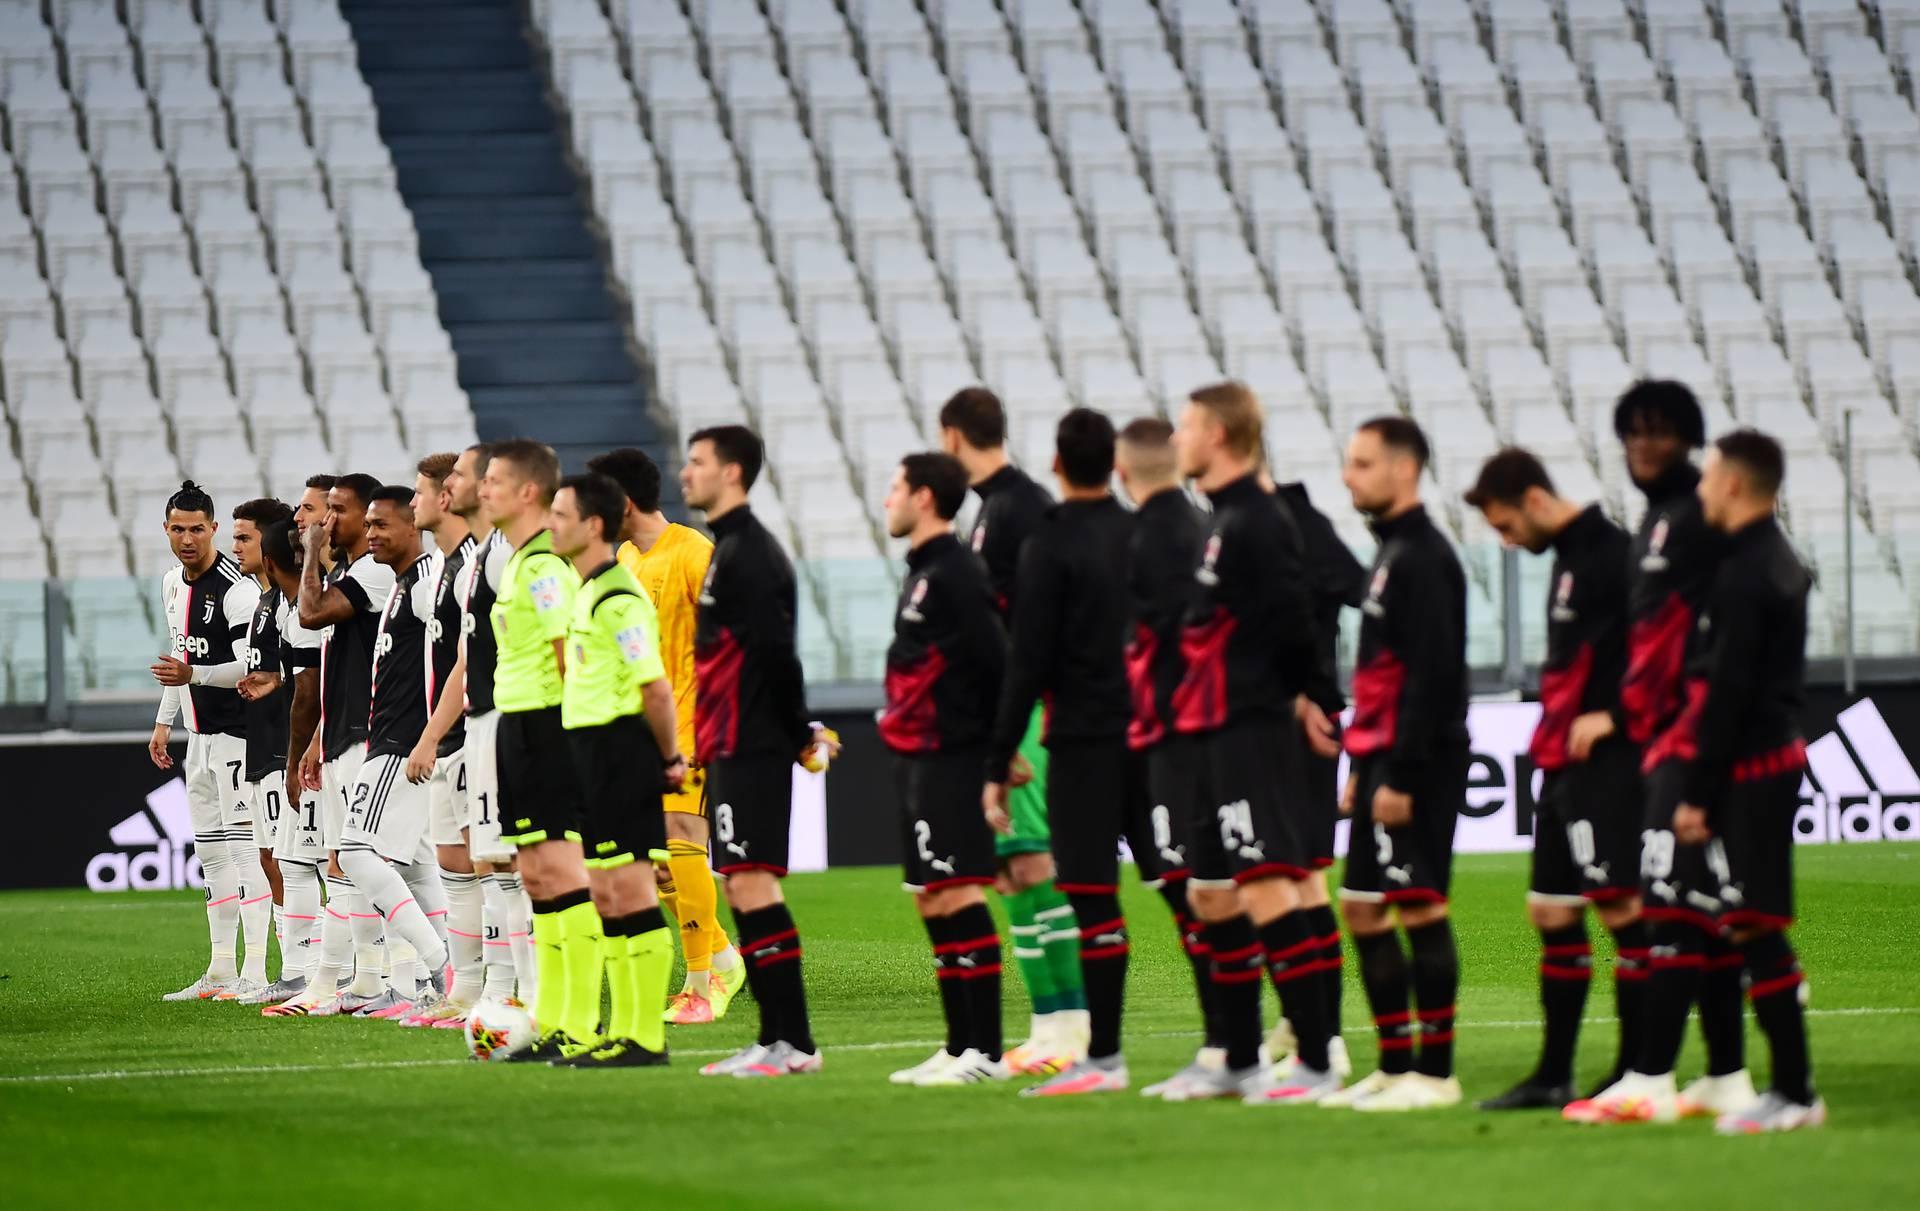 Coppa Italia Semi Final Second Leg - Juventus v AC Milan